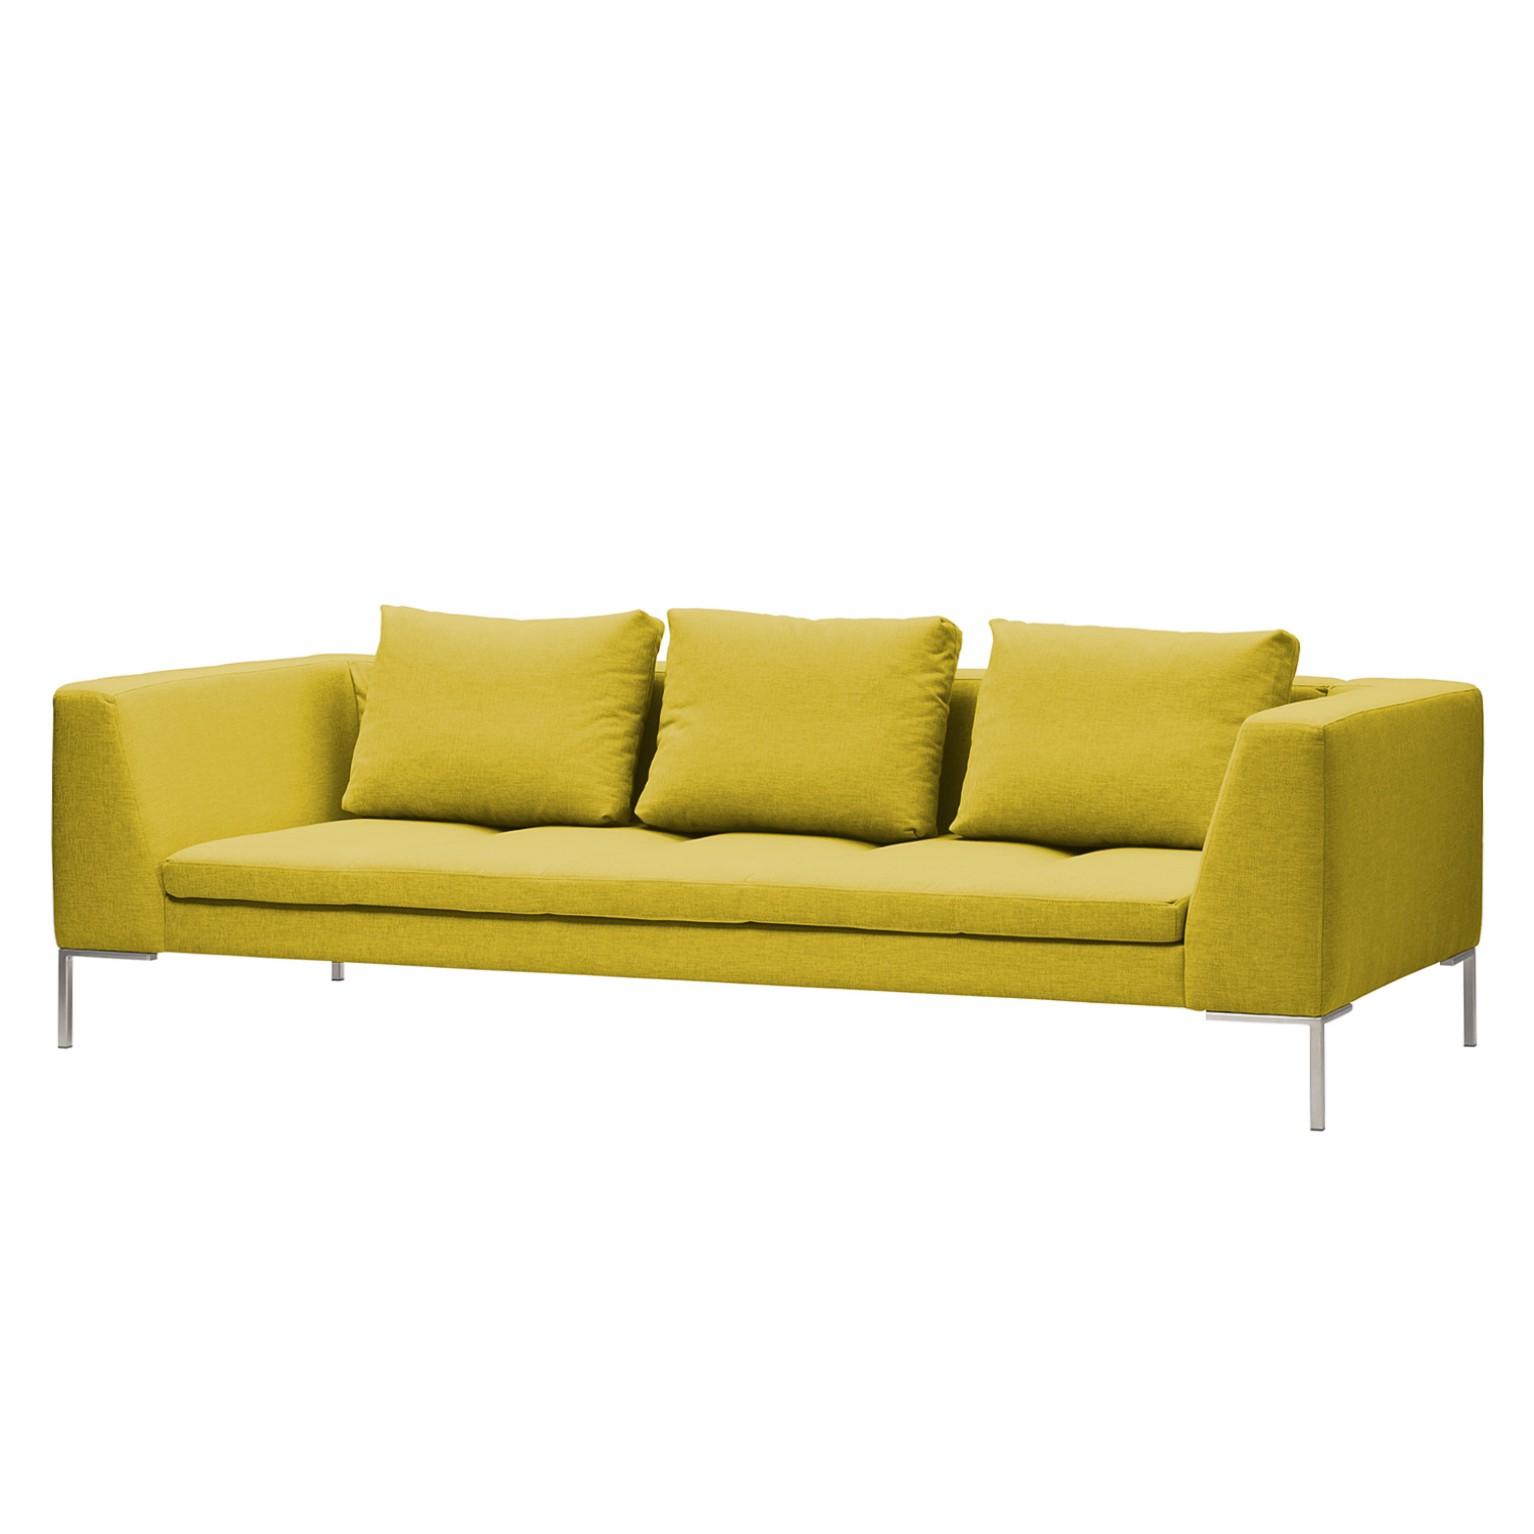 Sofa Madison (3-Sitzer) - Webstoff - Stoff Milan Gelb, Studio Copenhagen